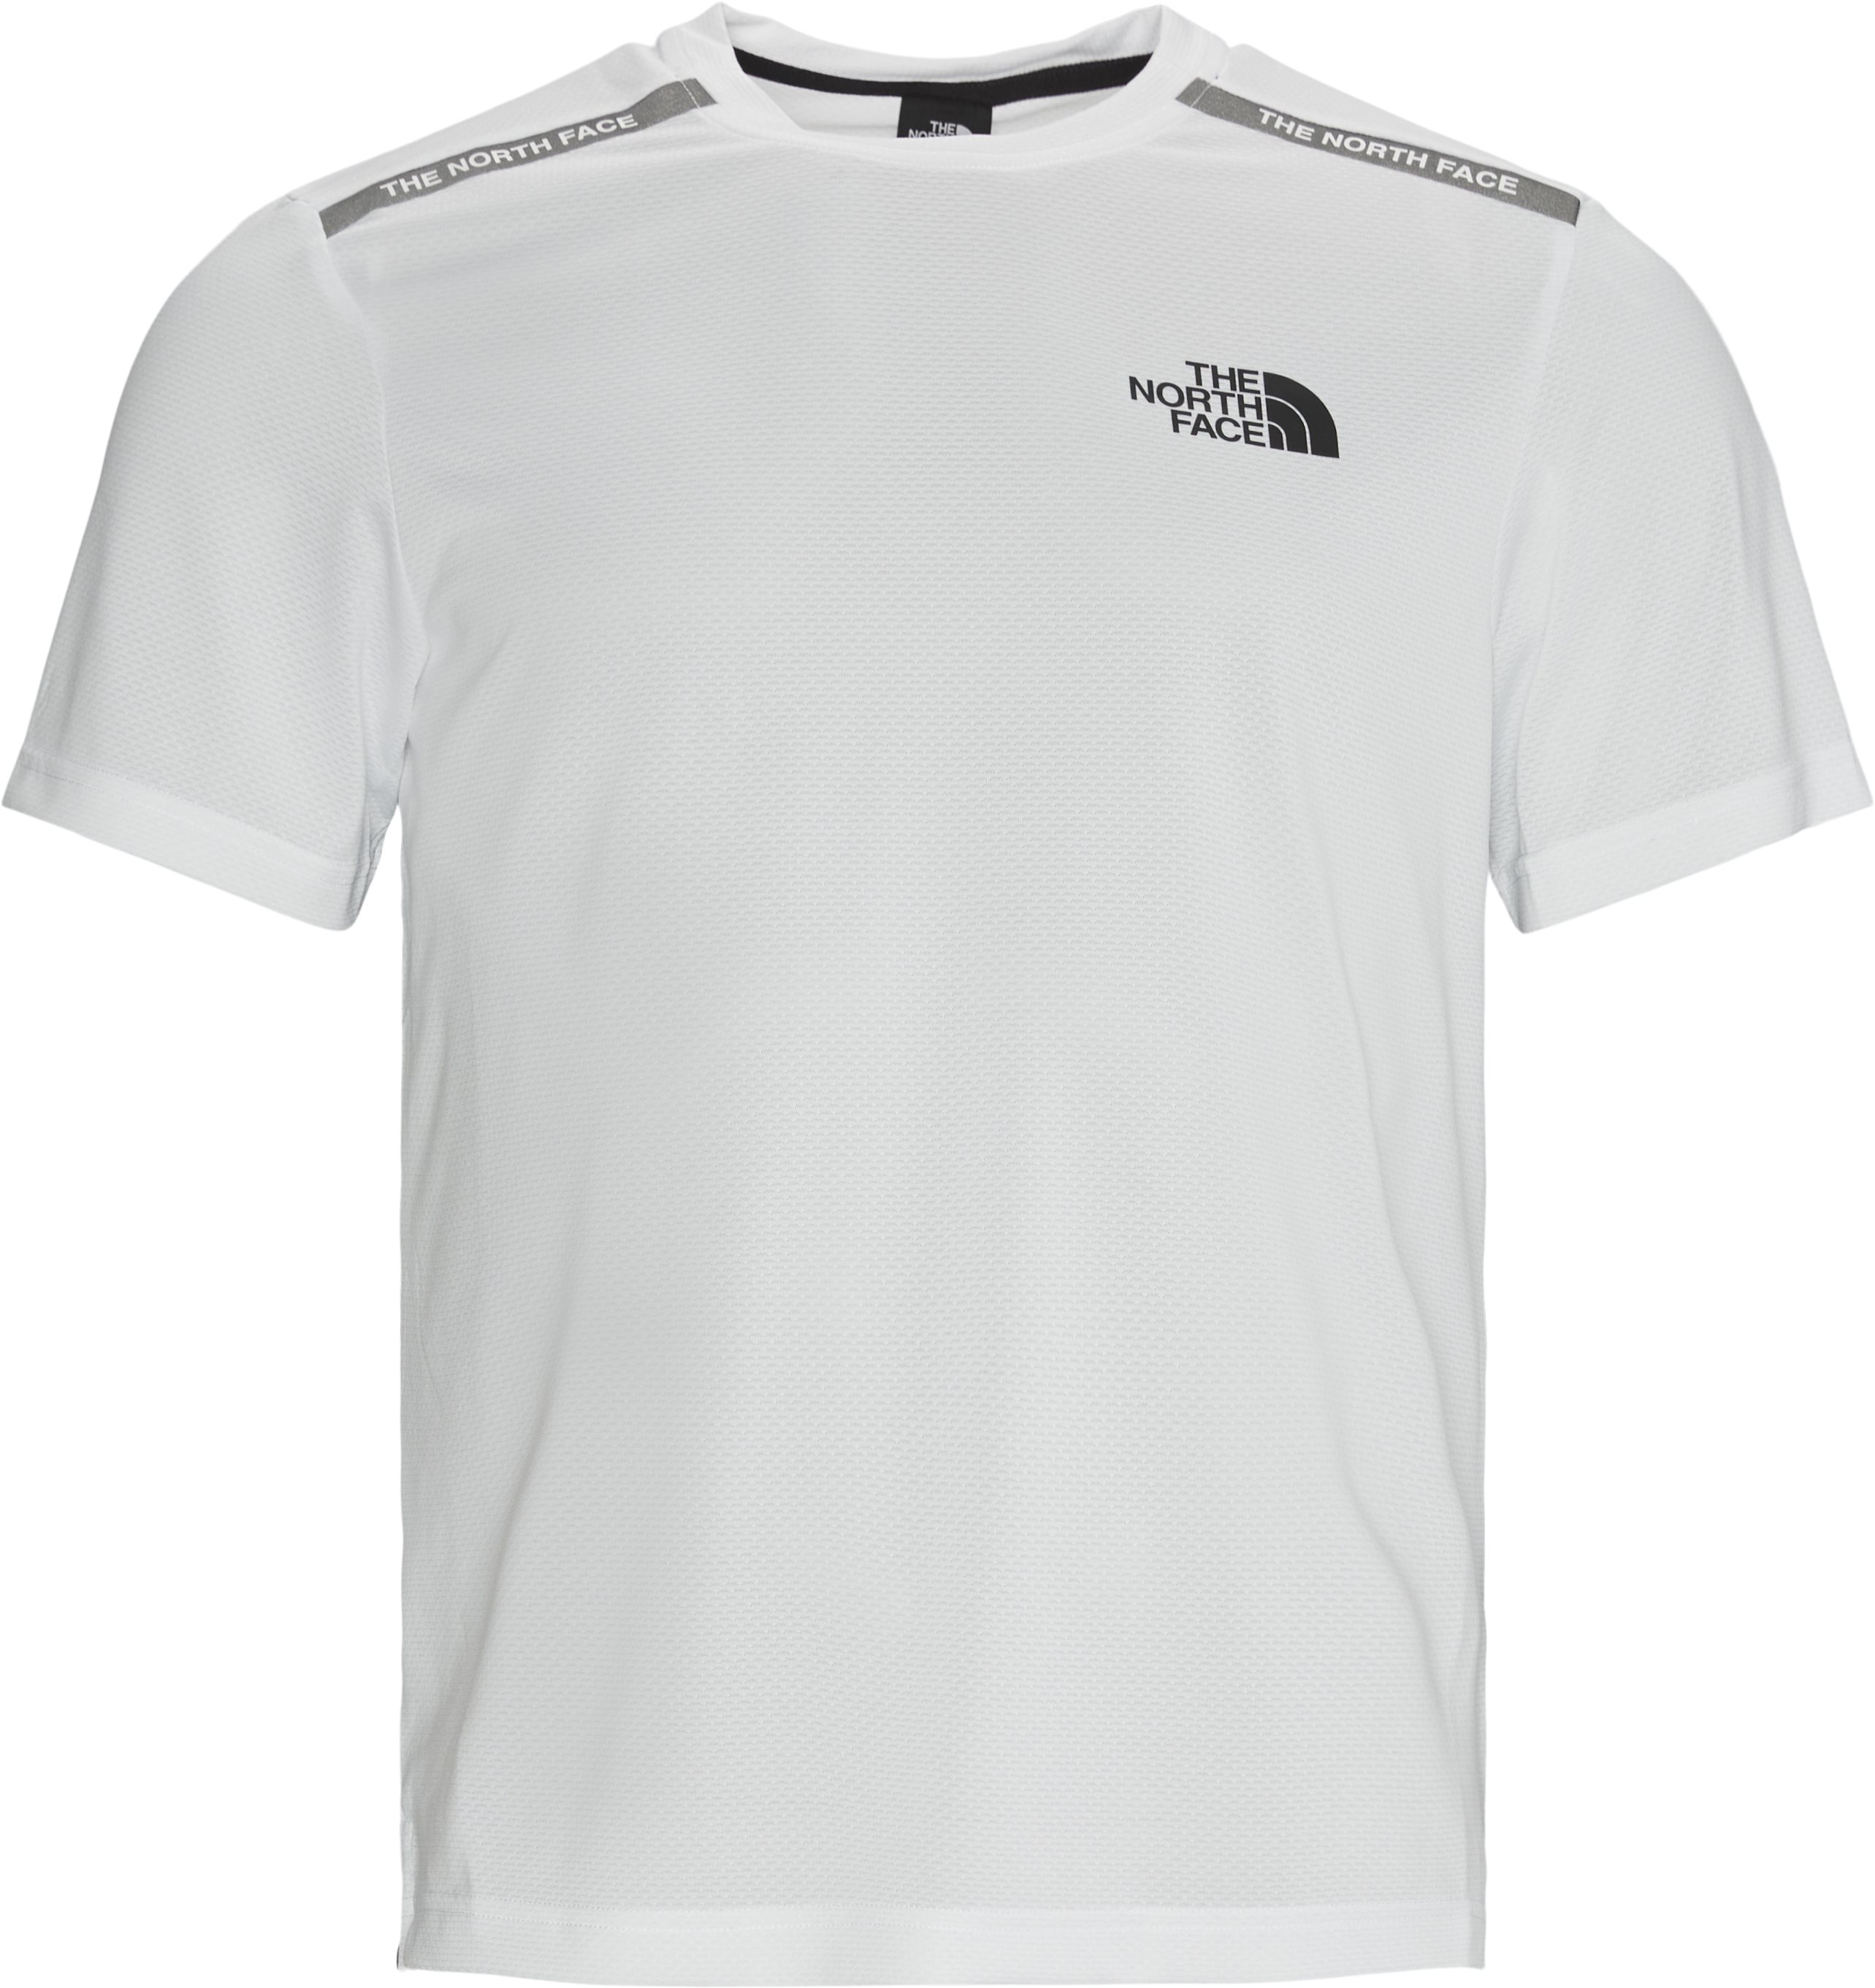 Eu Tee - T-shirts - Regular - Vit